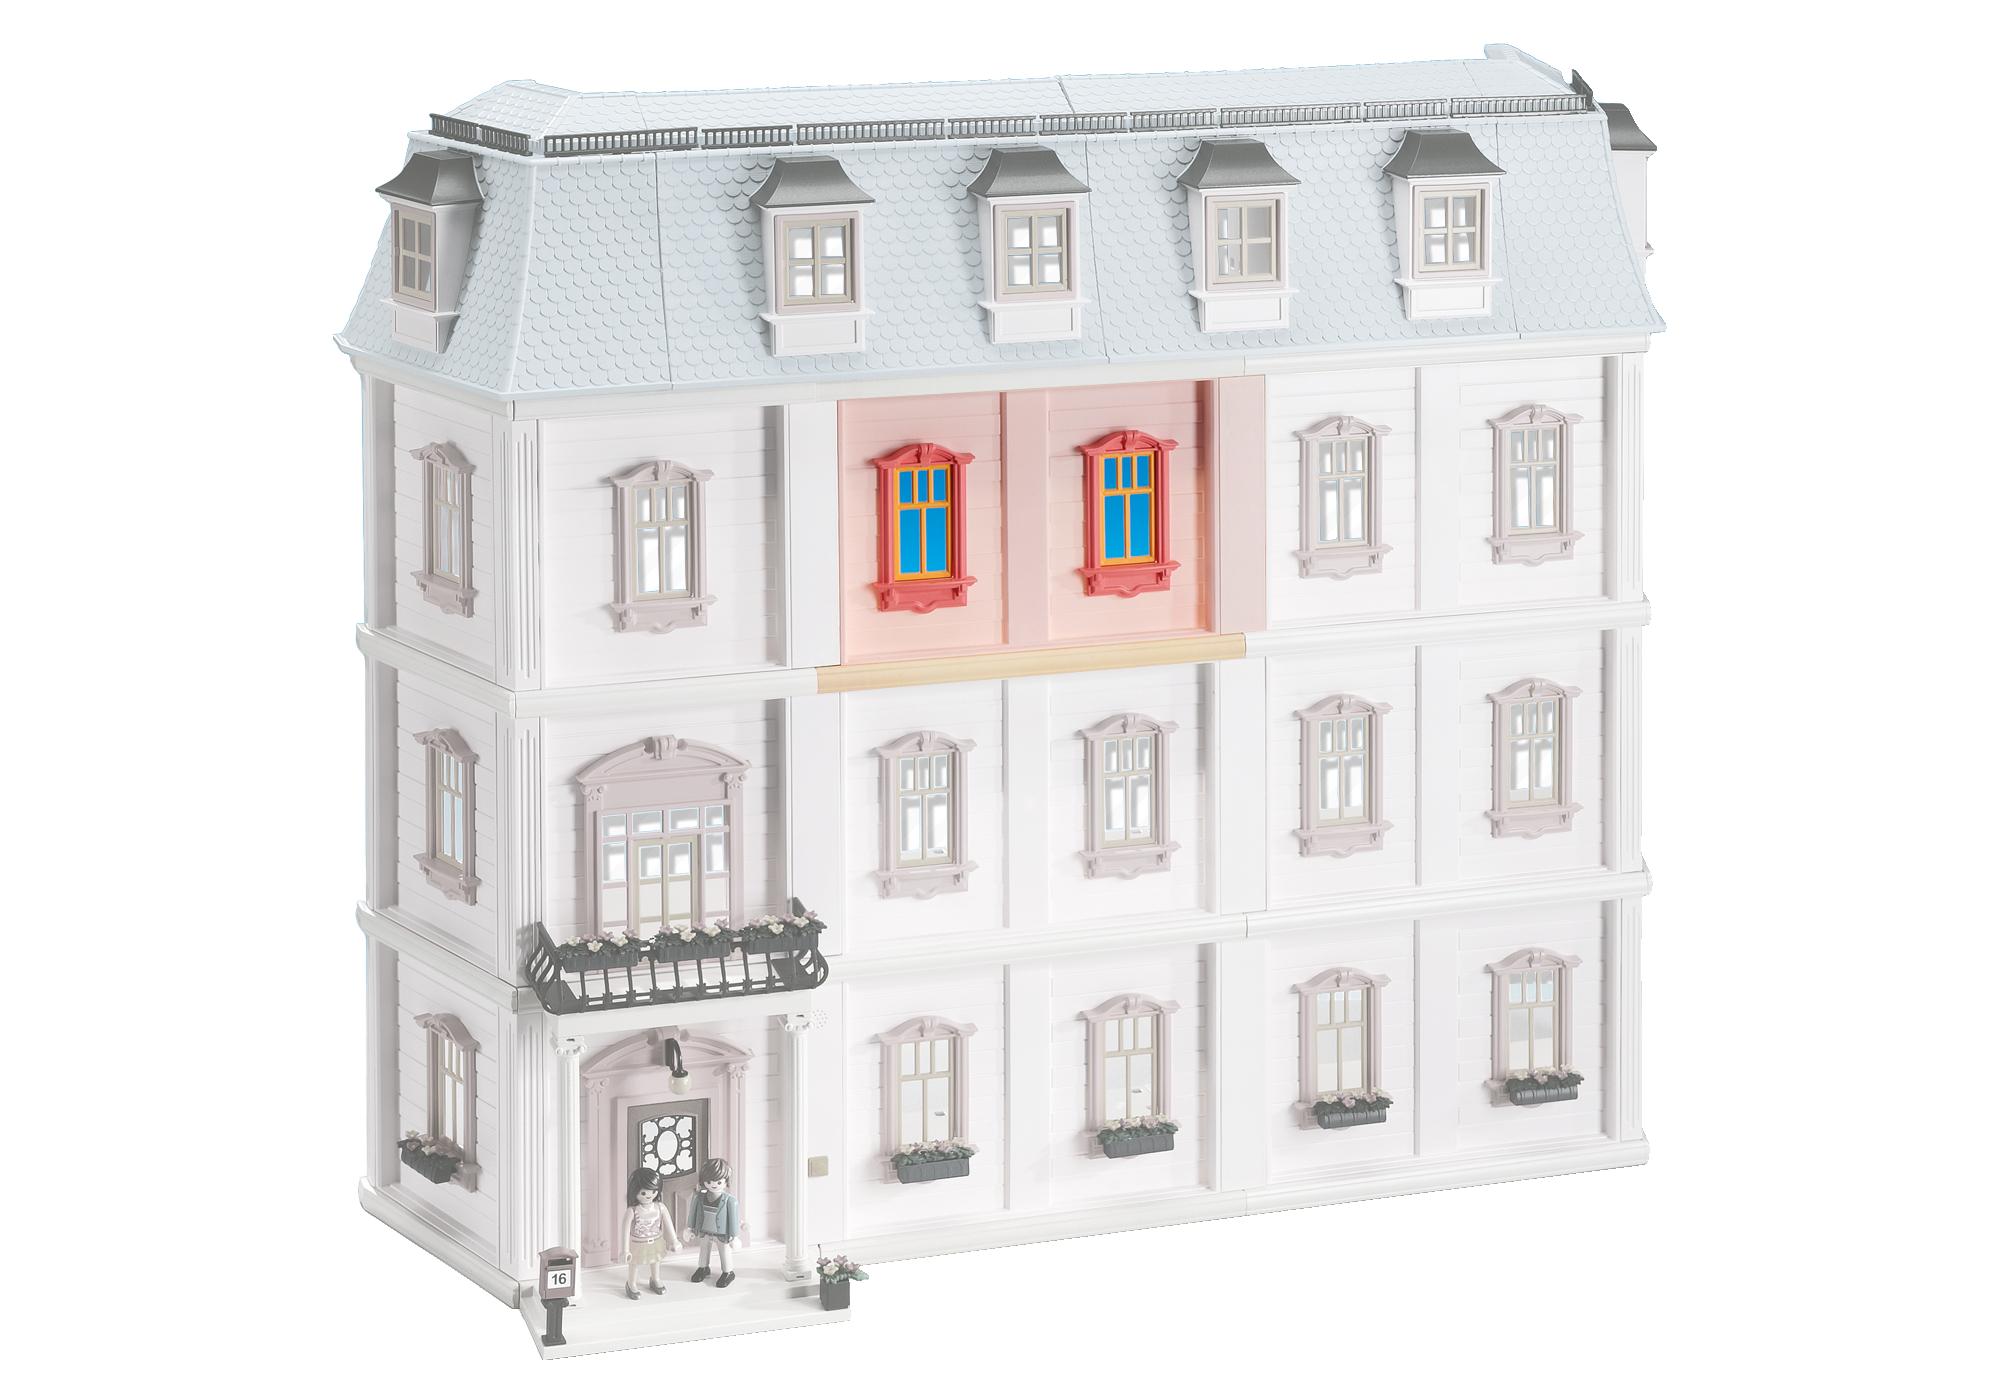 http://media.playmobil.com/i/playmobil/6454_product_detail/Extensión C para la Casa de Muñecas Romántica (ref. 5303)